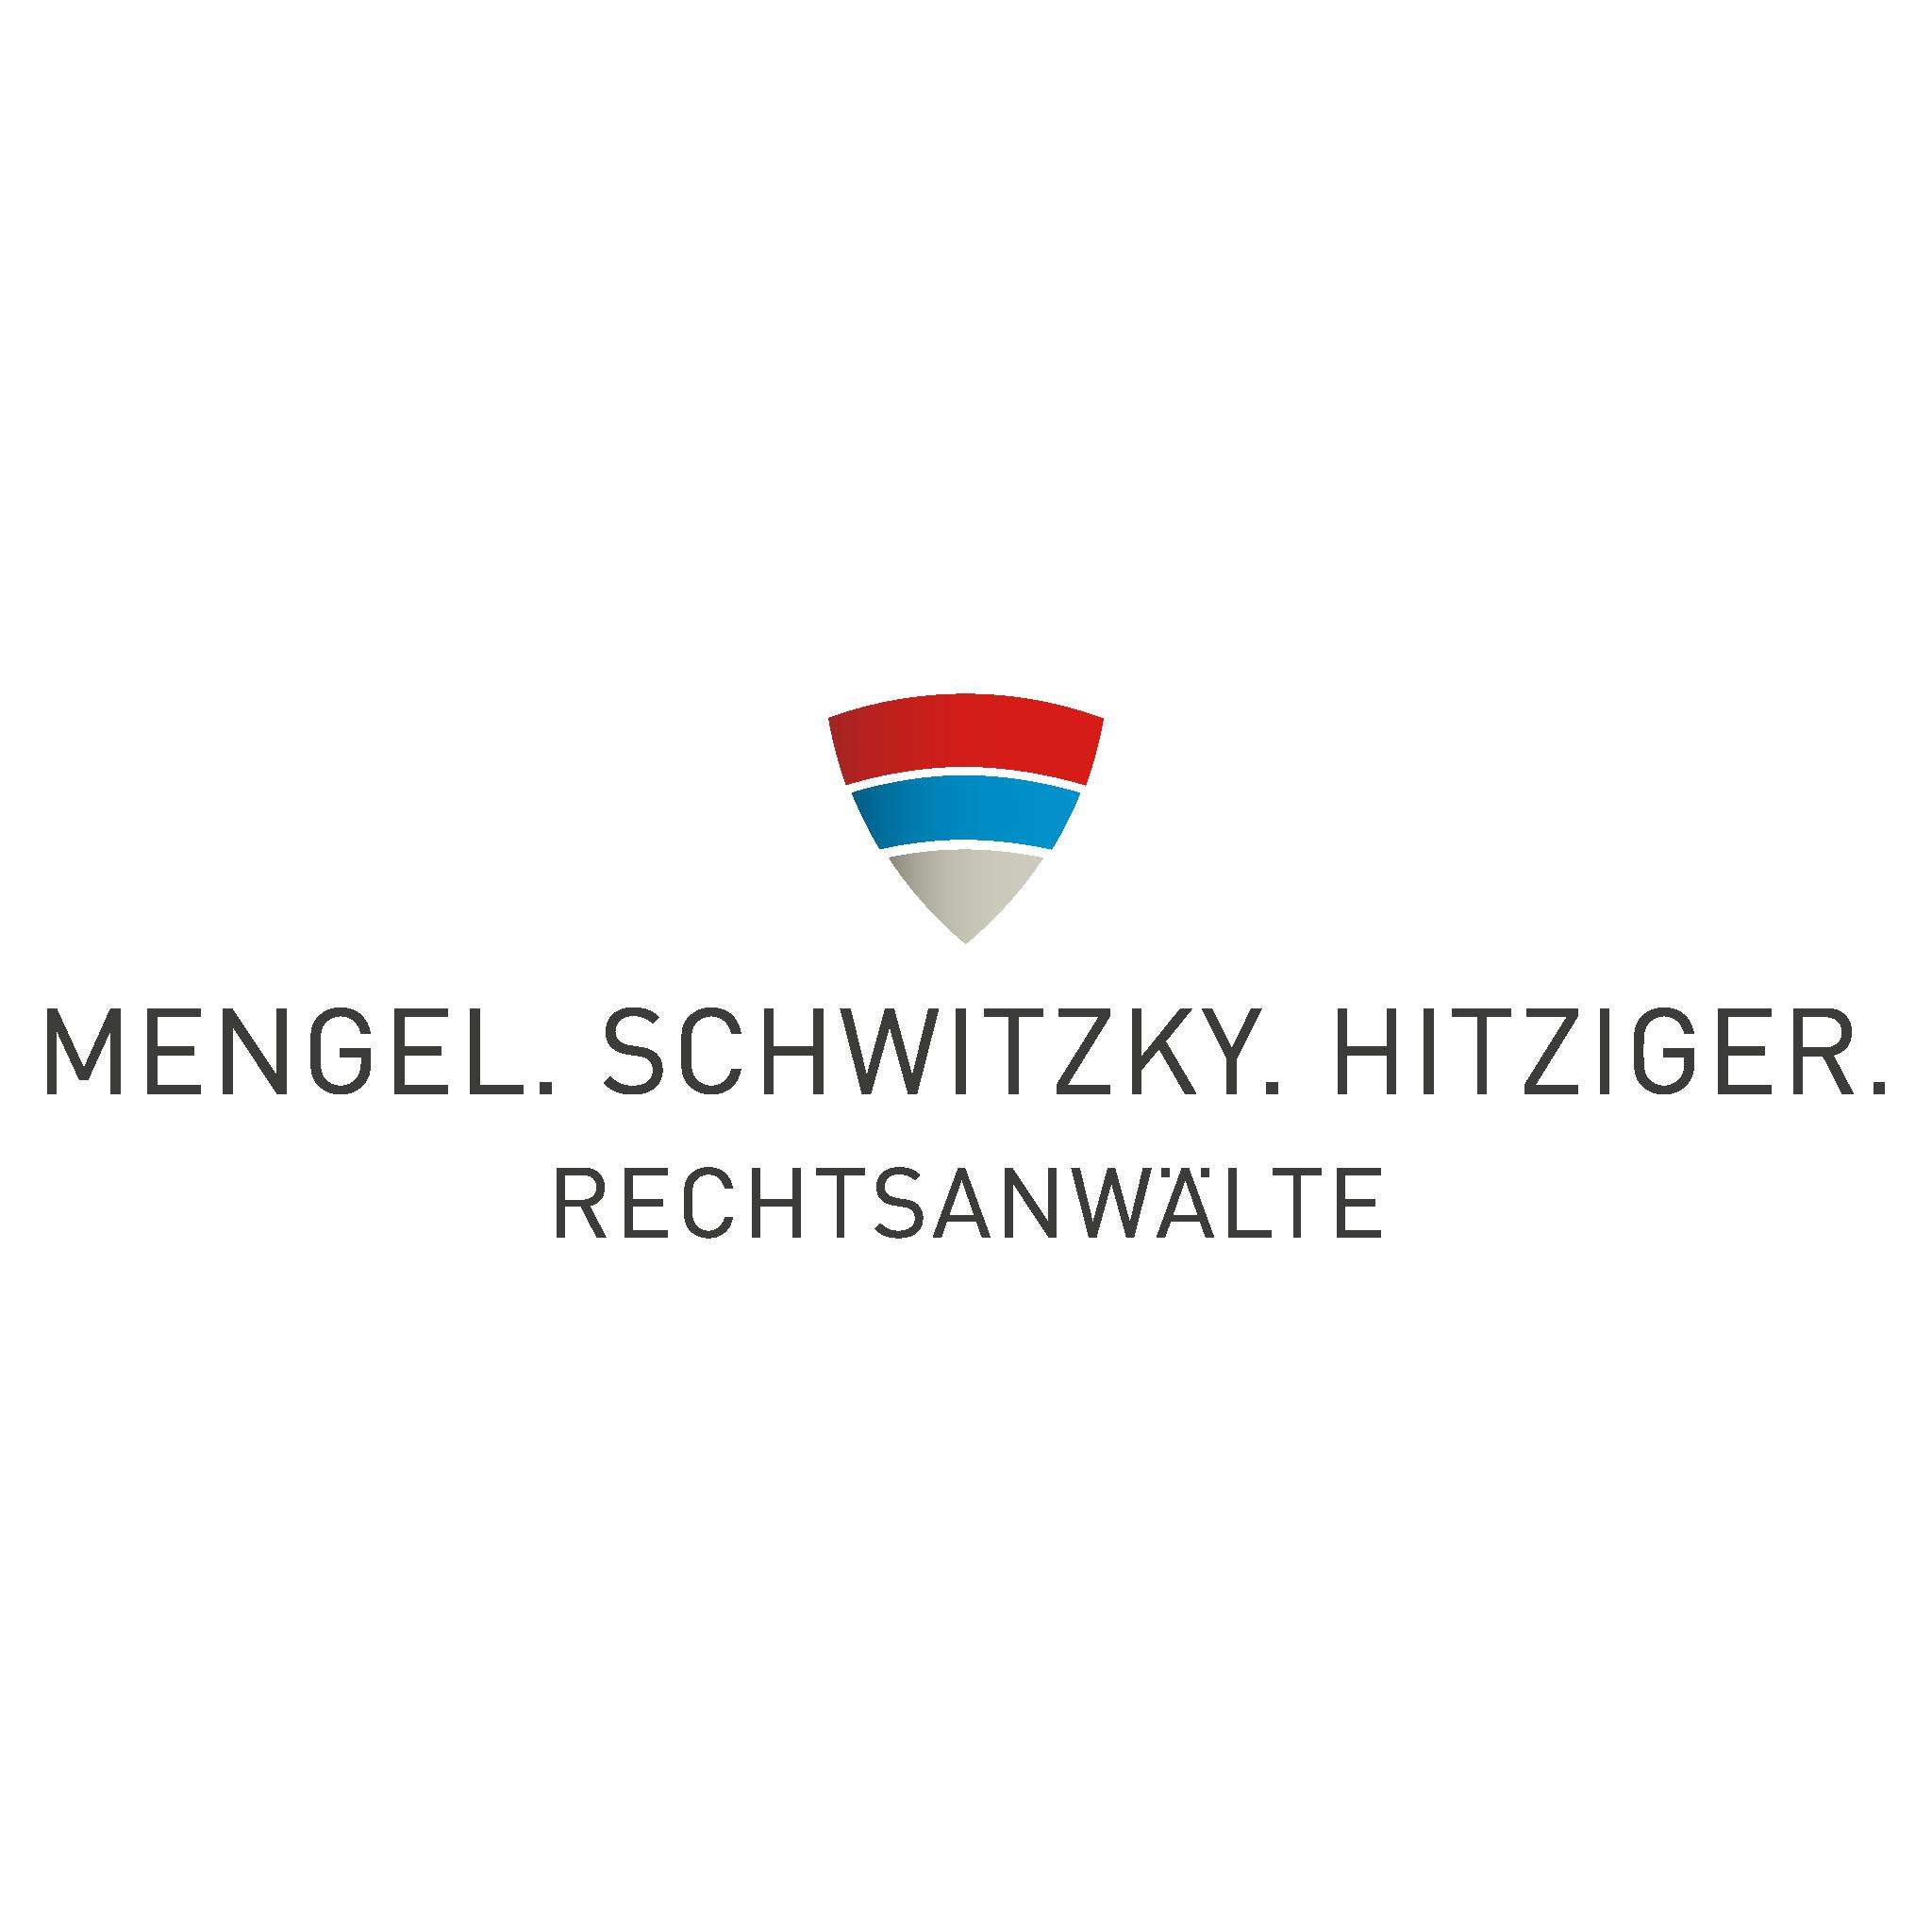 Mengel, Schwitzky, Hitziger - Rechtsanwälte